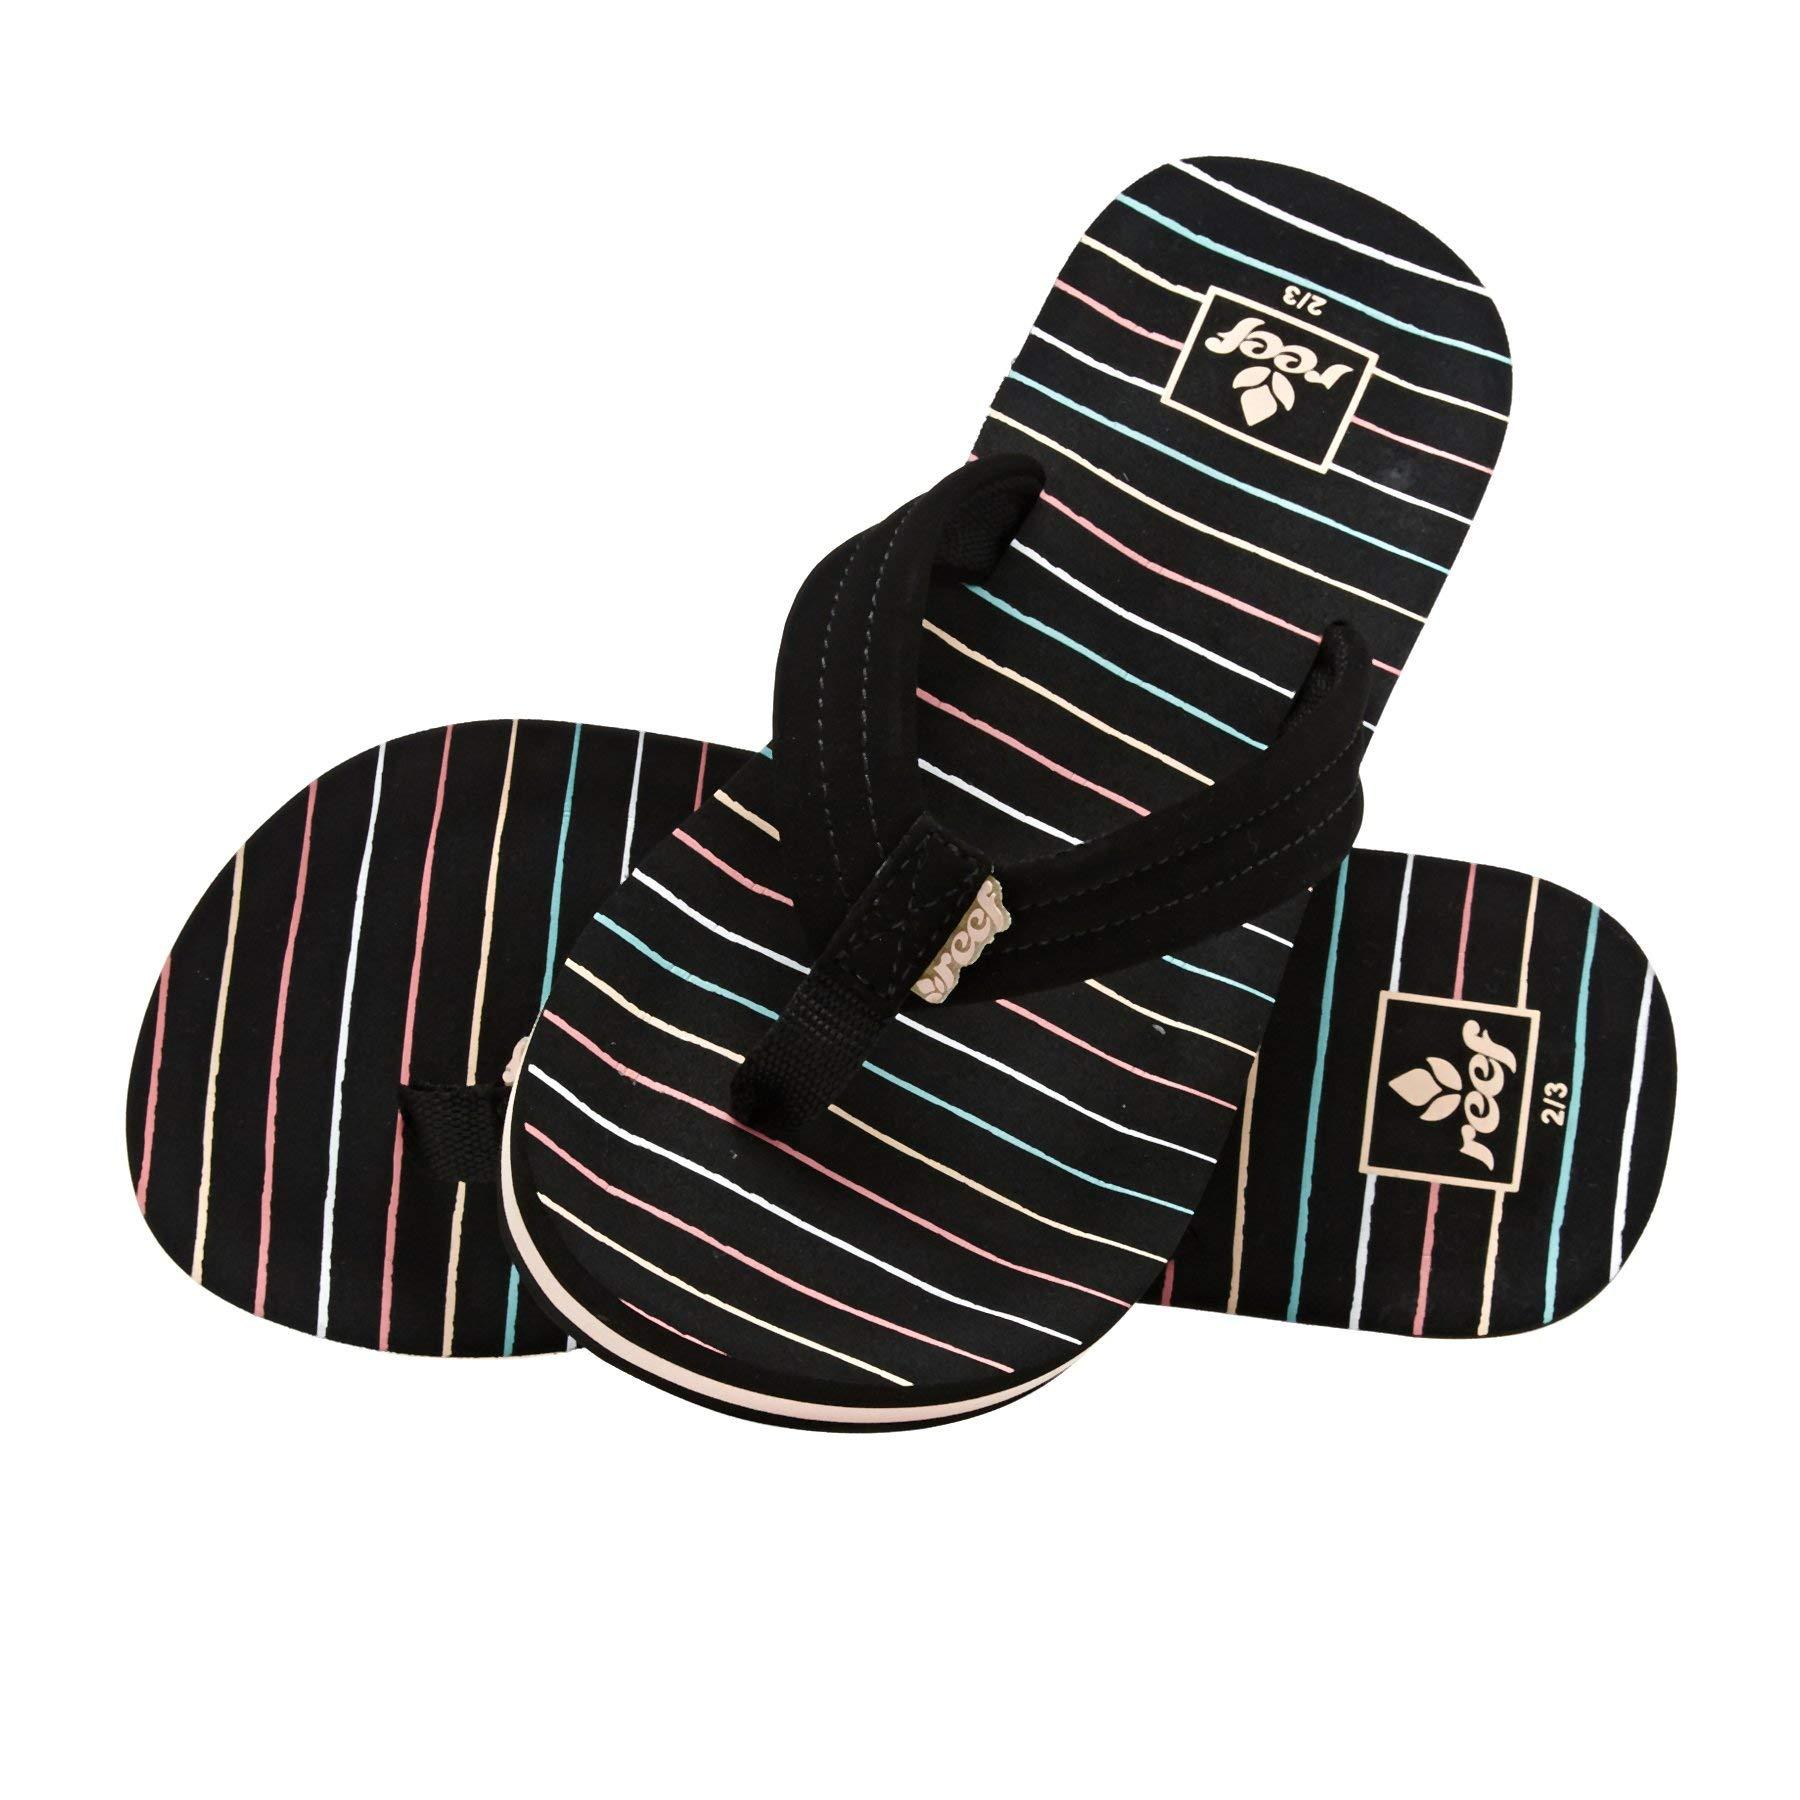 Reef Kids Ahi Kids Sandals 2-3 D(M) US Men Stripes